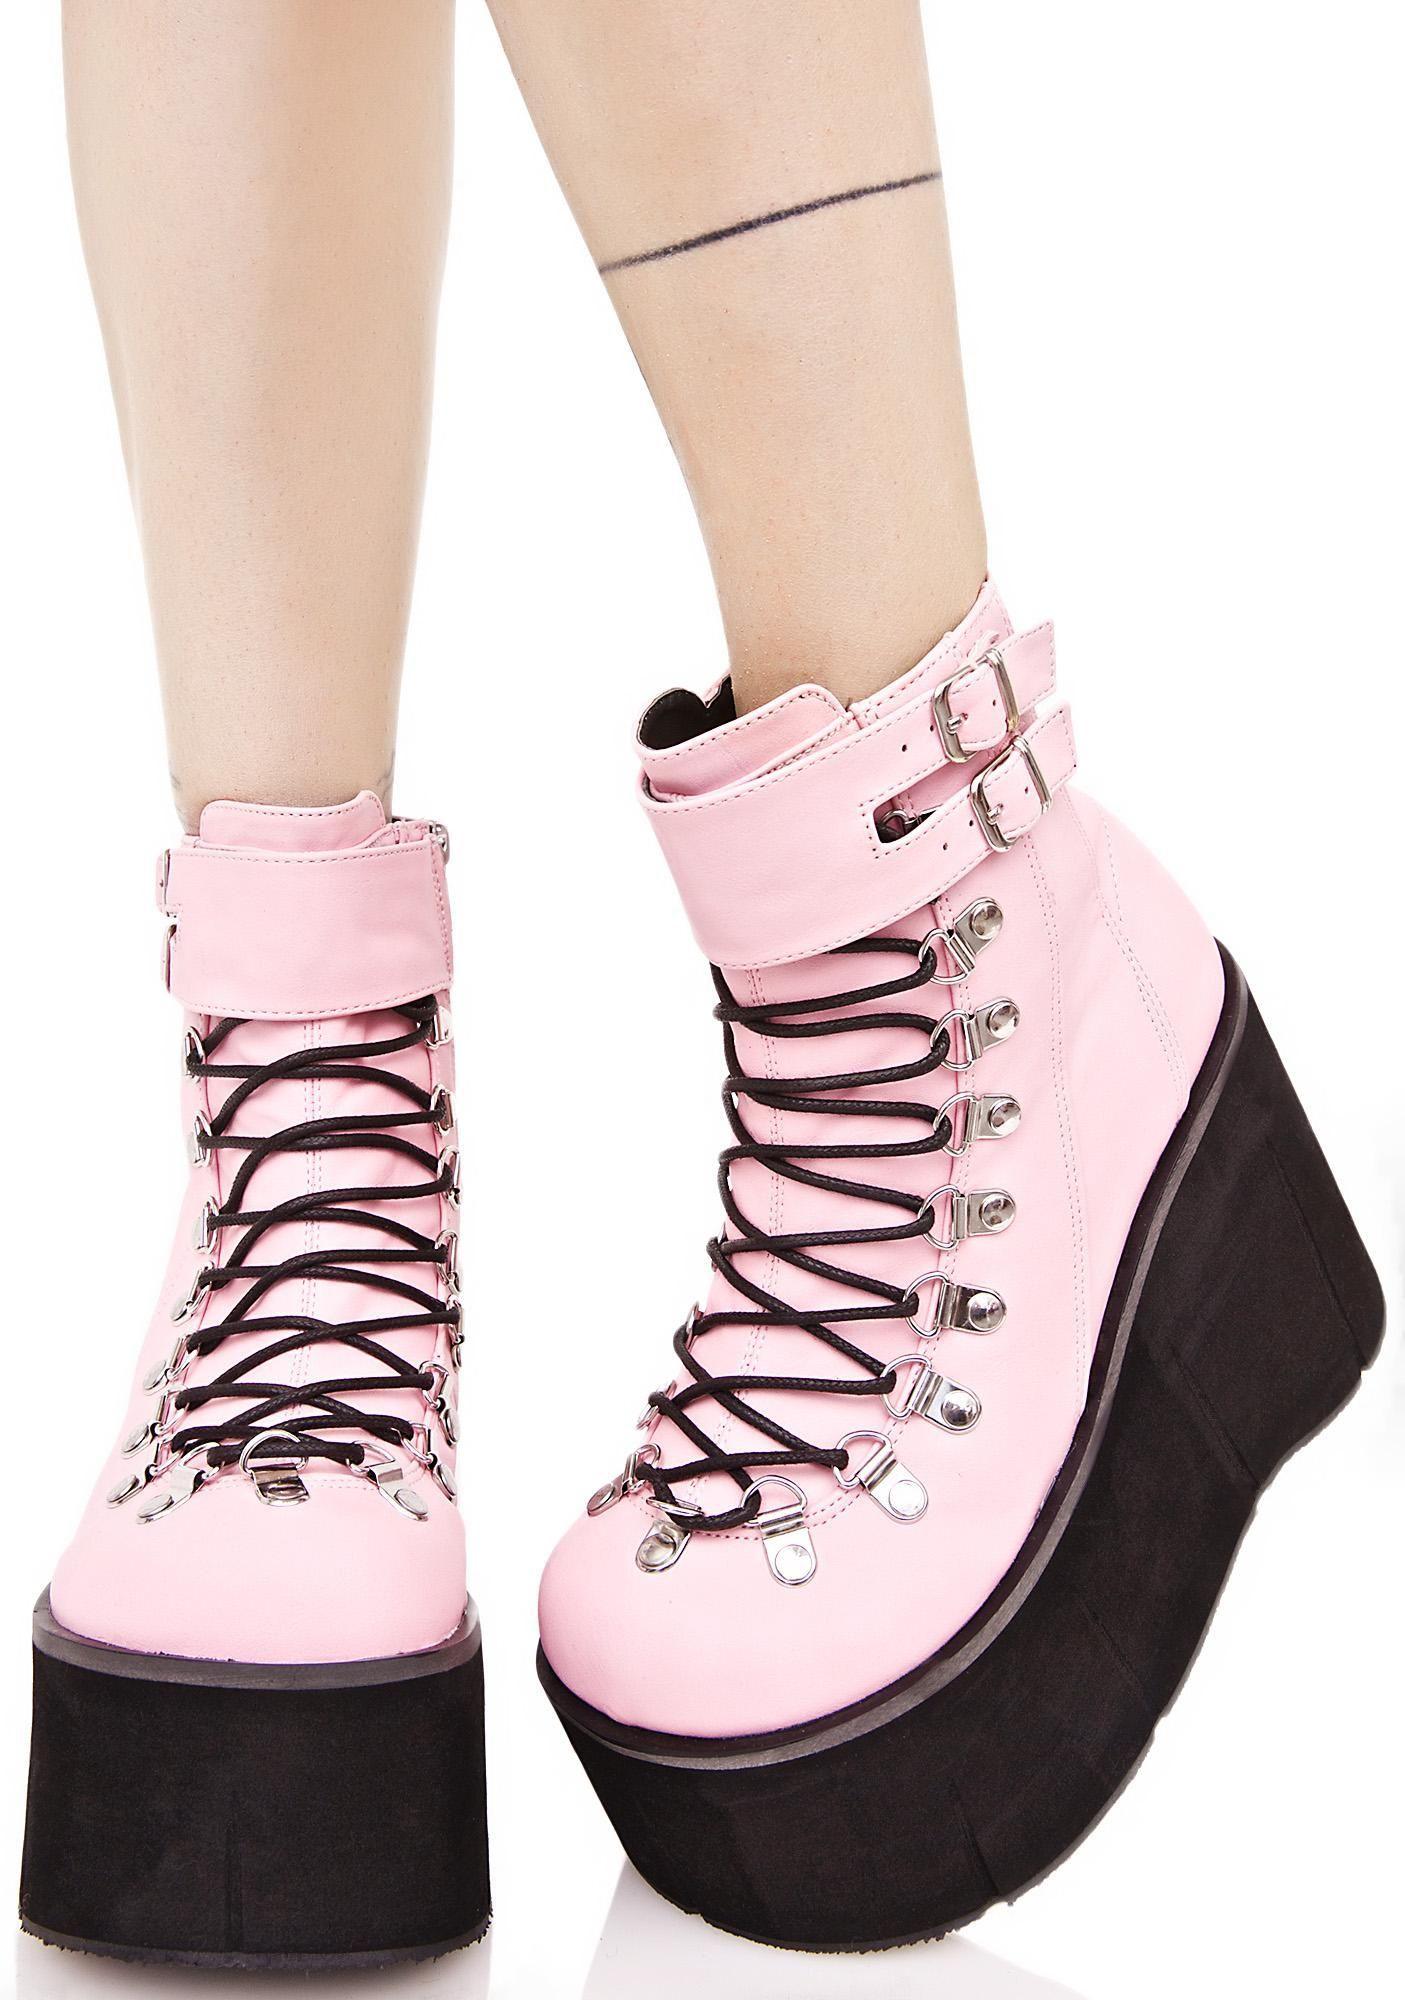 8ac007bad02 Kawaii Pastel Goth Platform Boots Demonia Sweetie Kera Lace-Up Platform  Boots